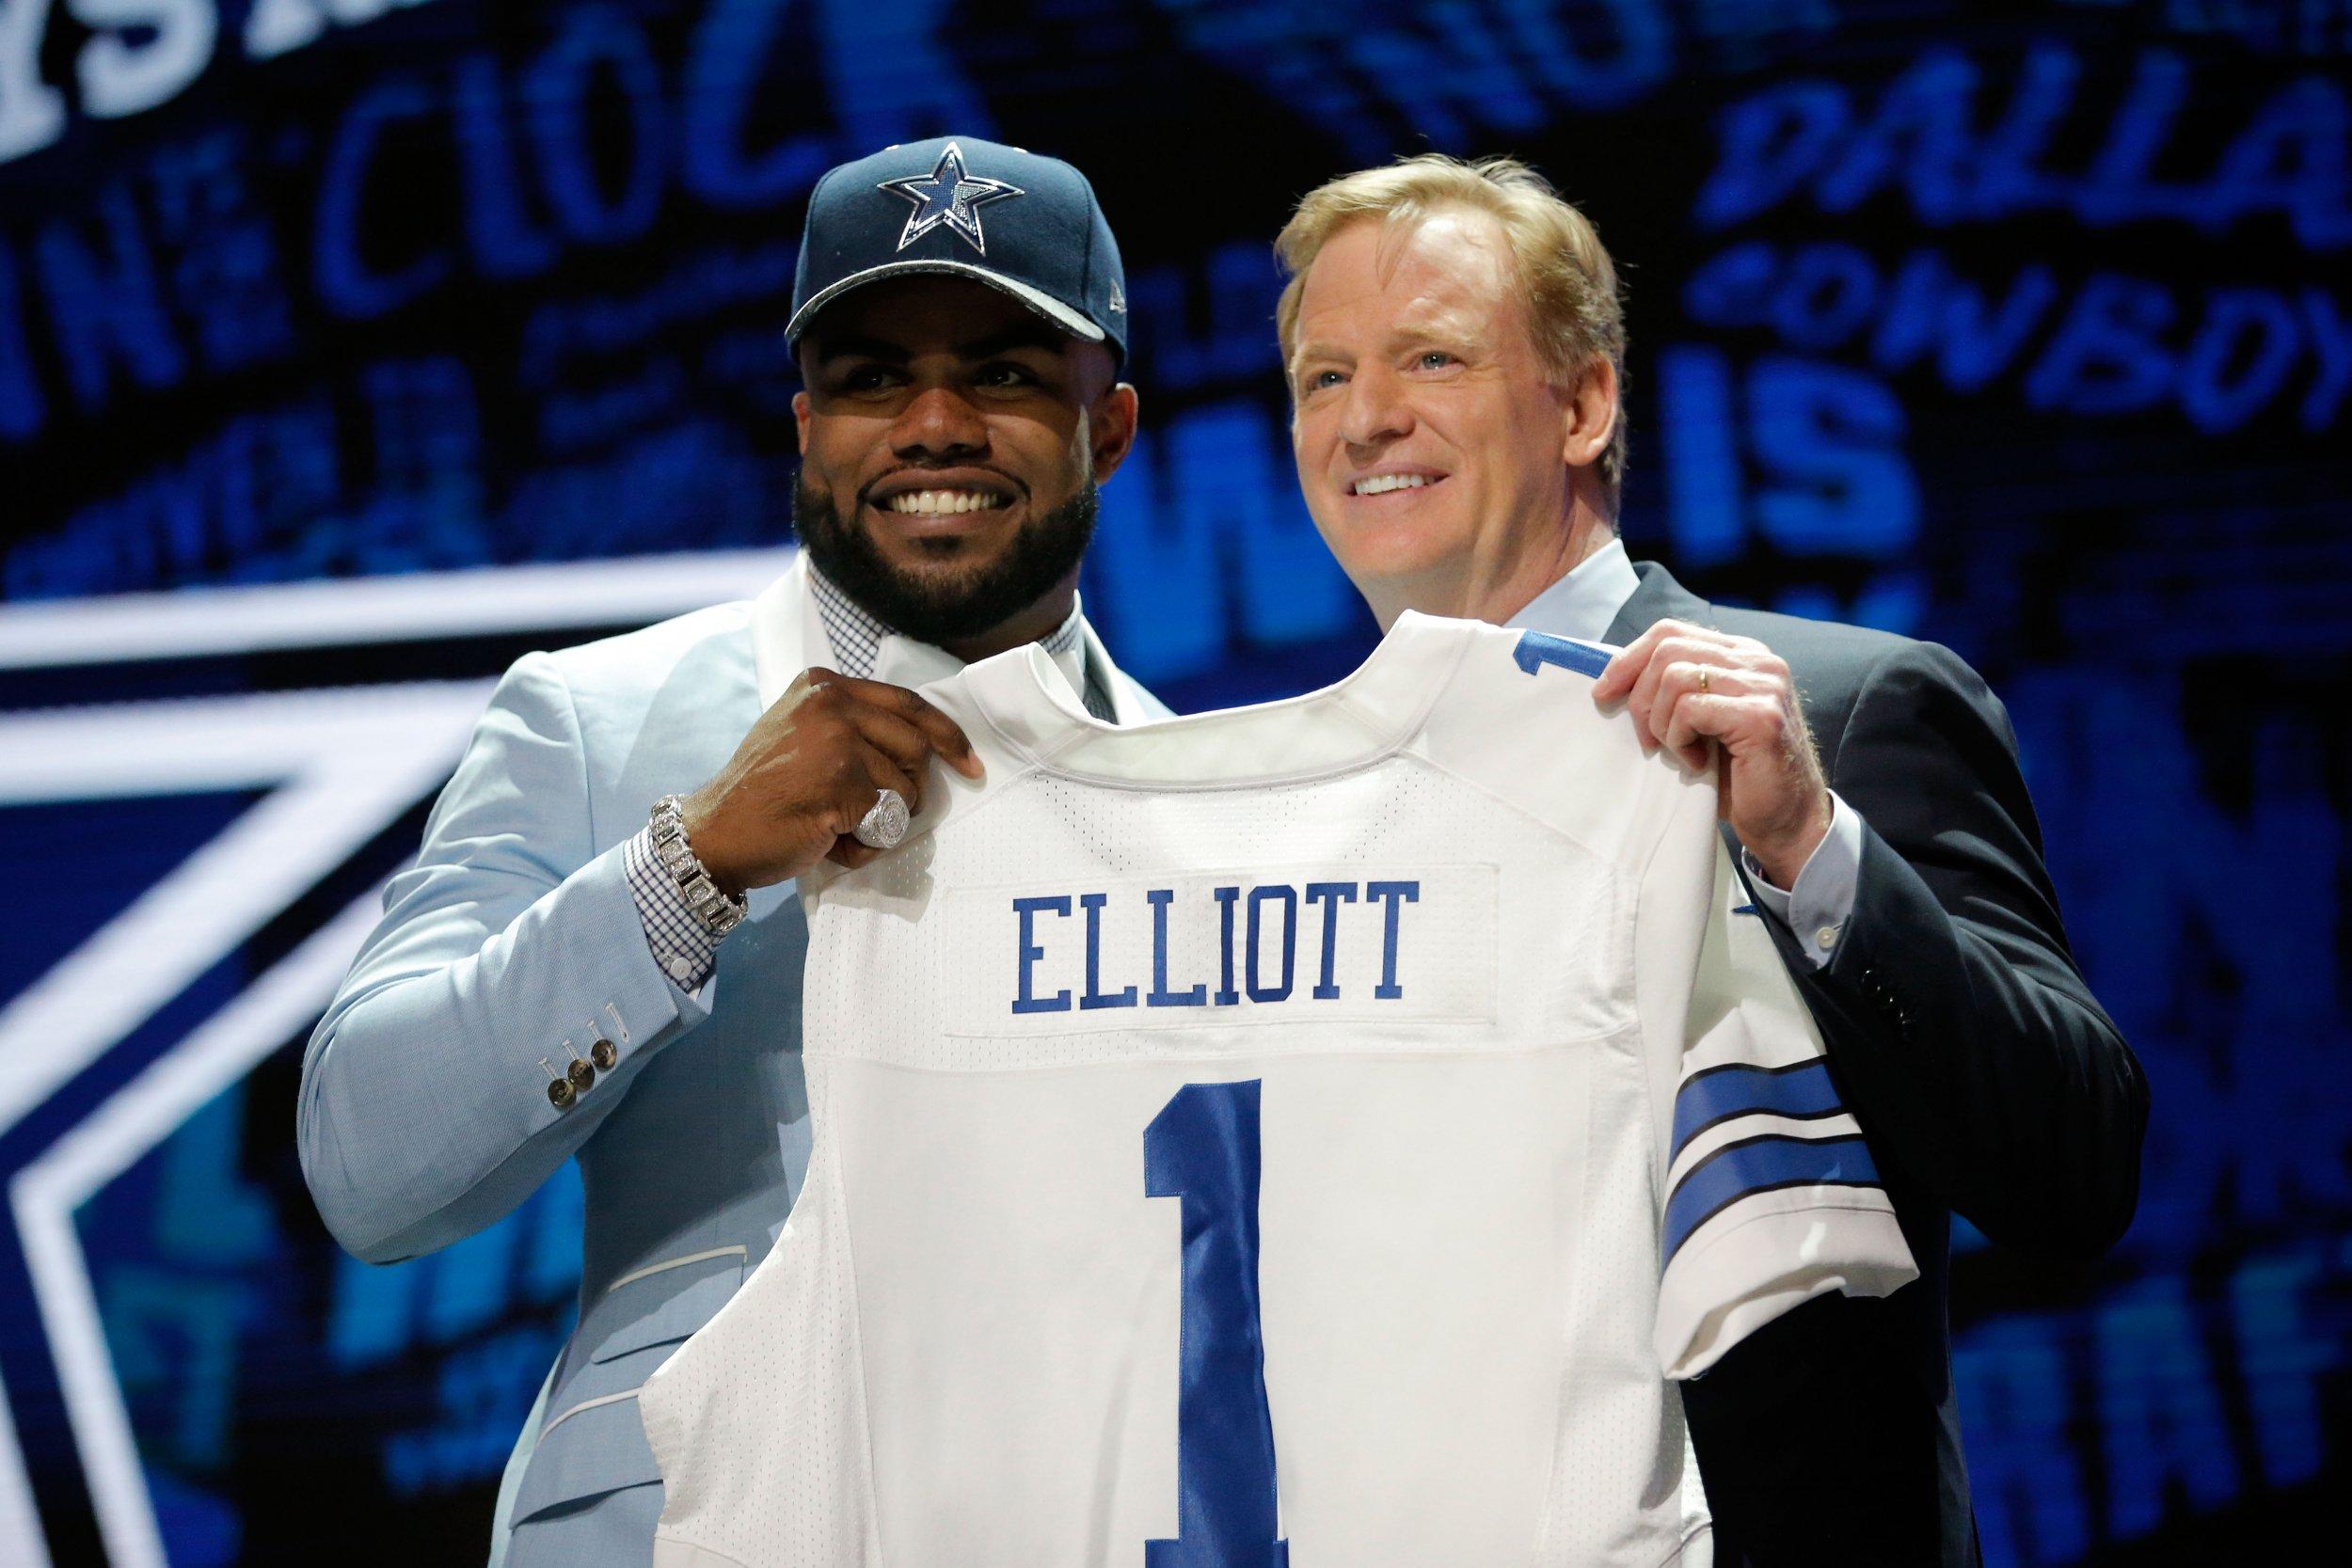 Dallas Cowboys running back Ezekiel Elliott, left, with NFL Commissioner Roger Goodell.